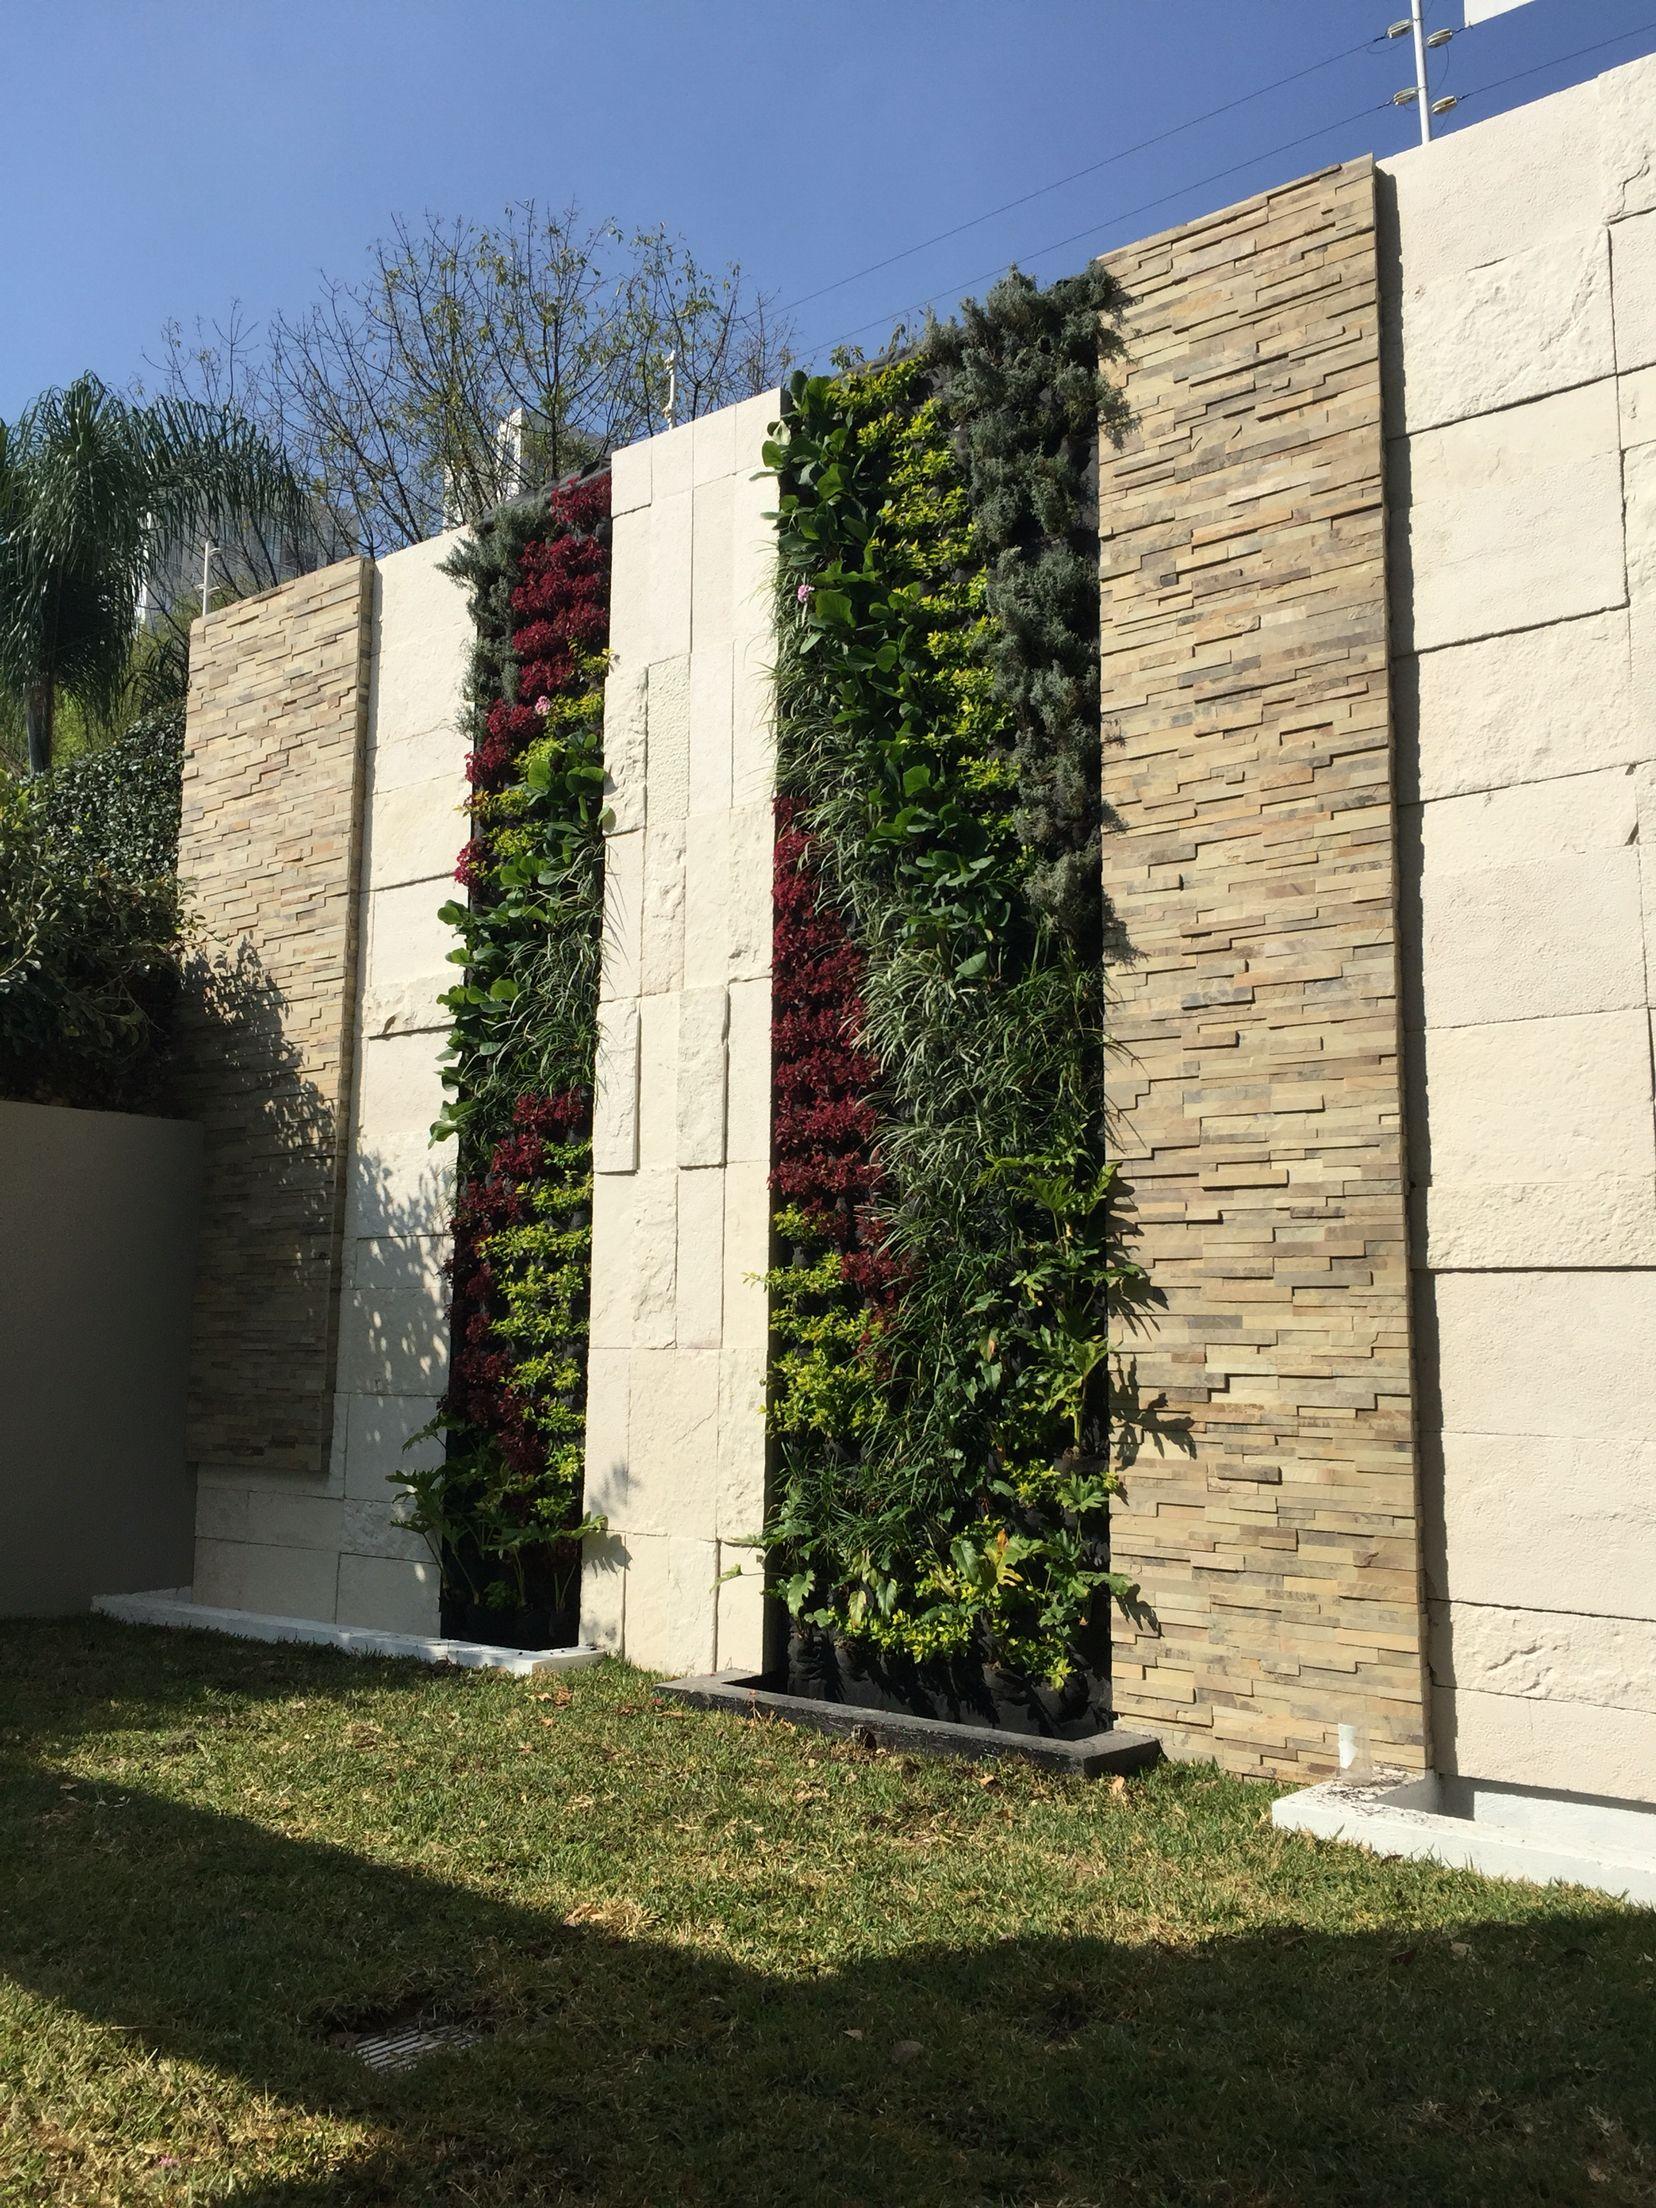 Muro verde jardin vertical green wall vertical gardens for Muros y fachadas verdes jardines verticales